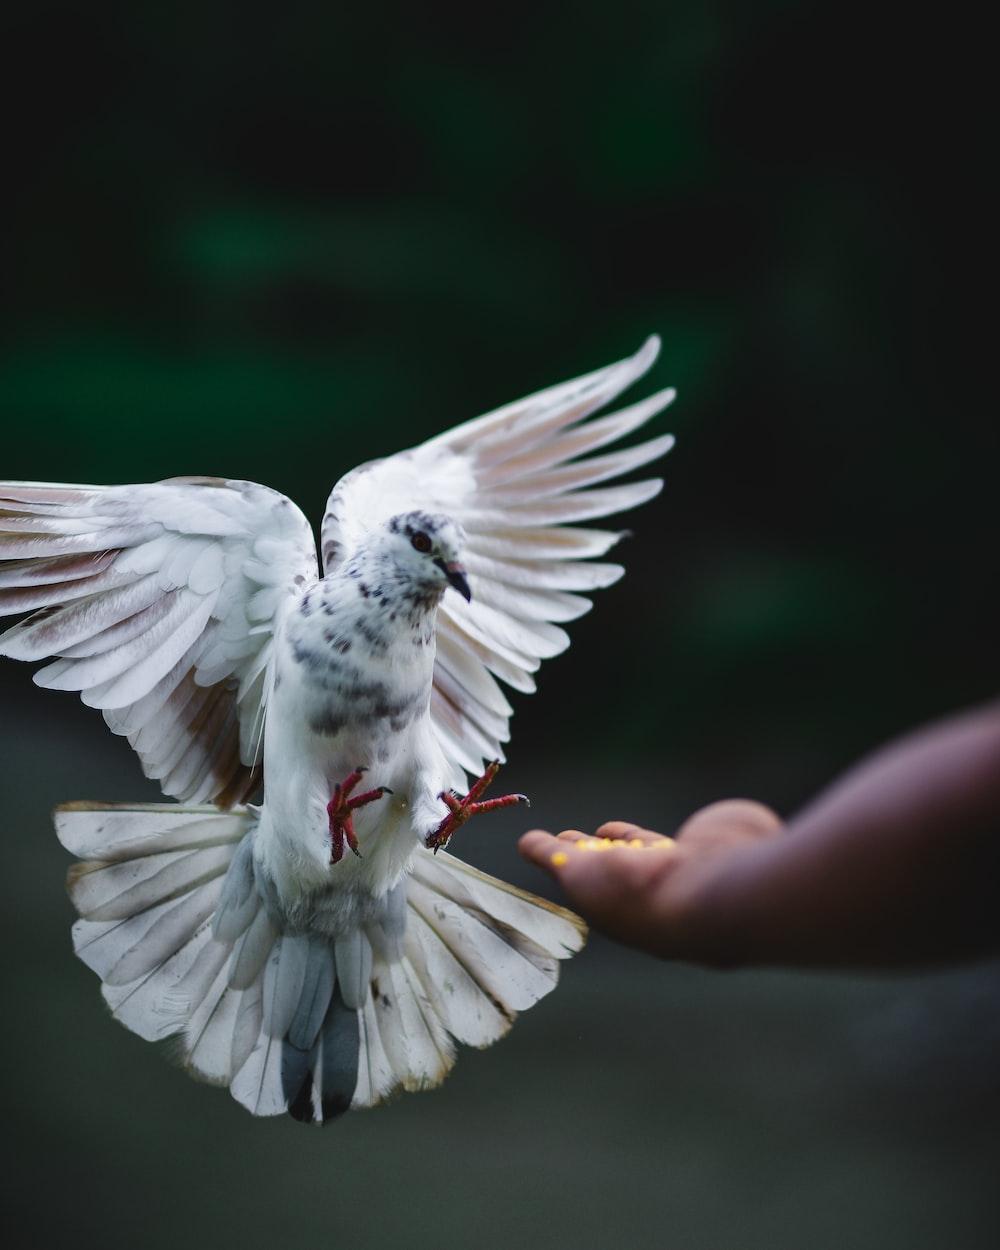 rock dove flying beside hand